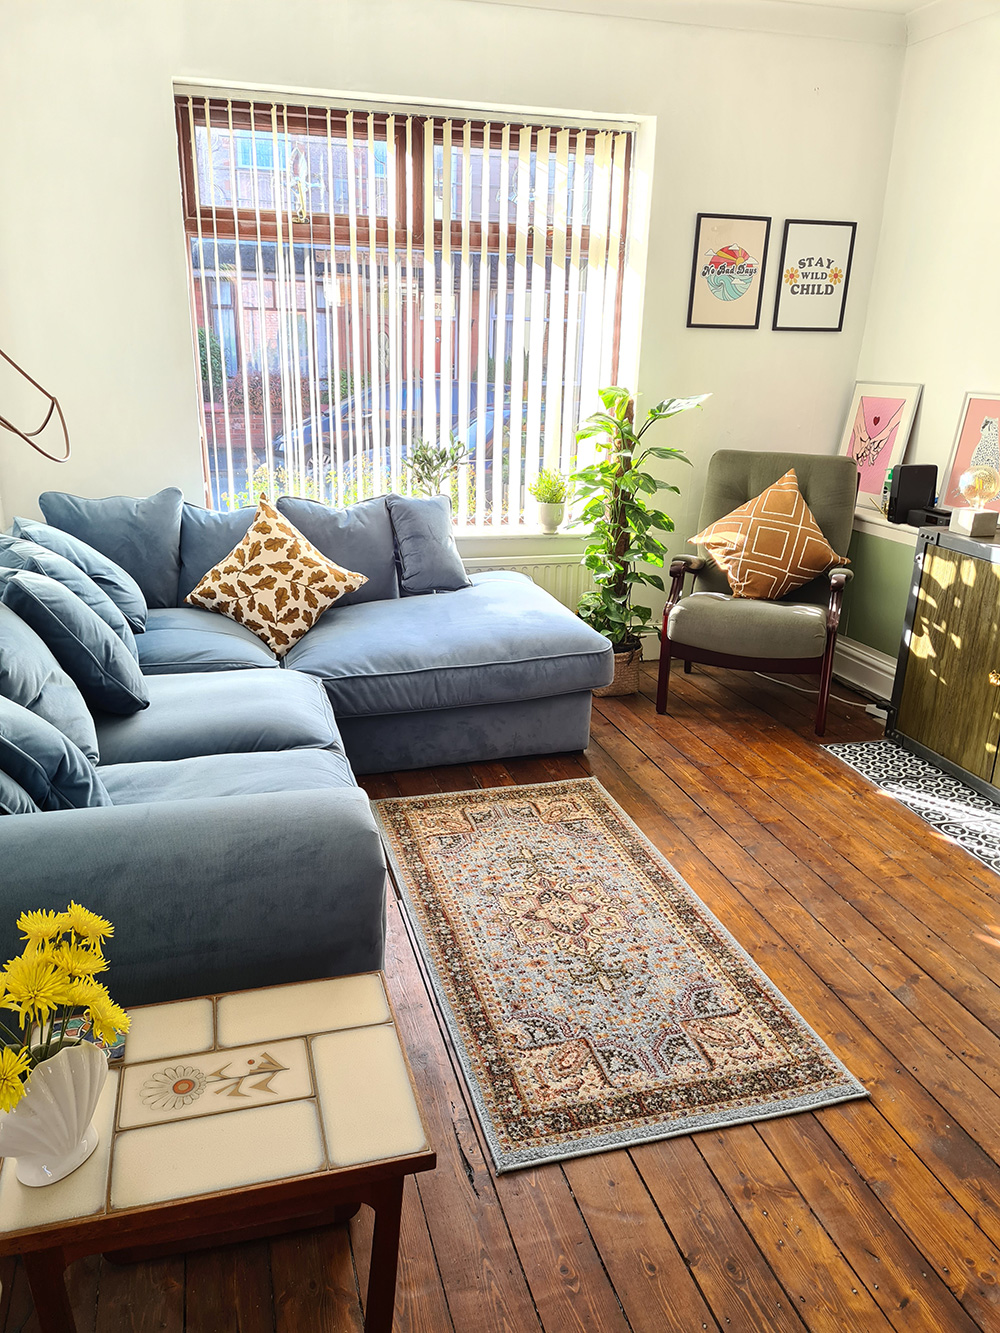 Large blue Baron right-hand corner sofa in velour fabric